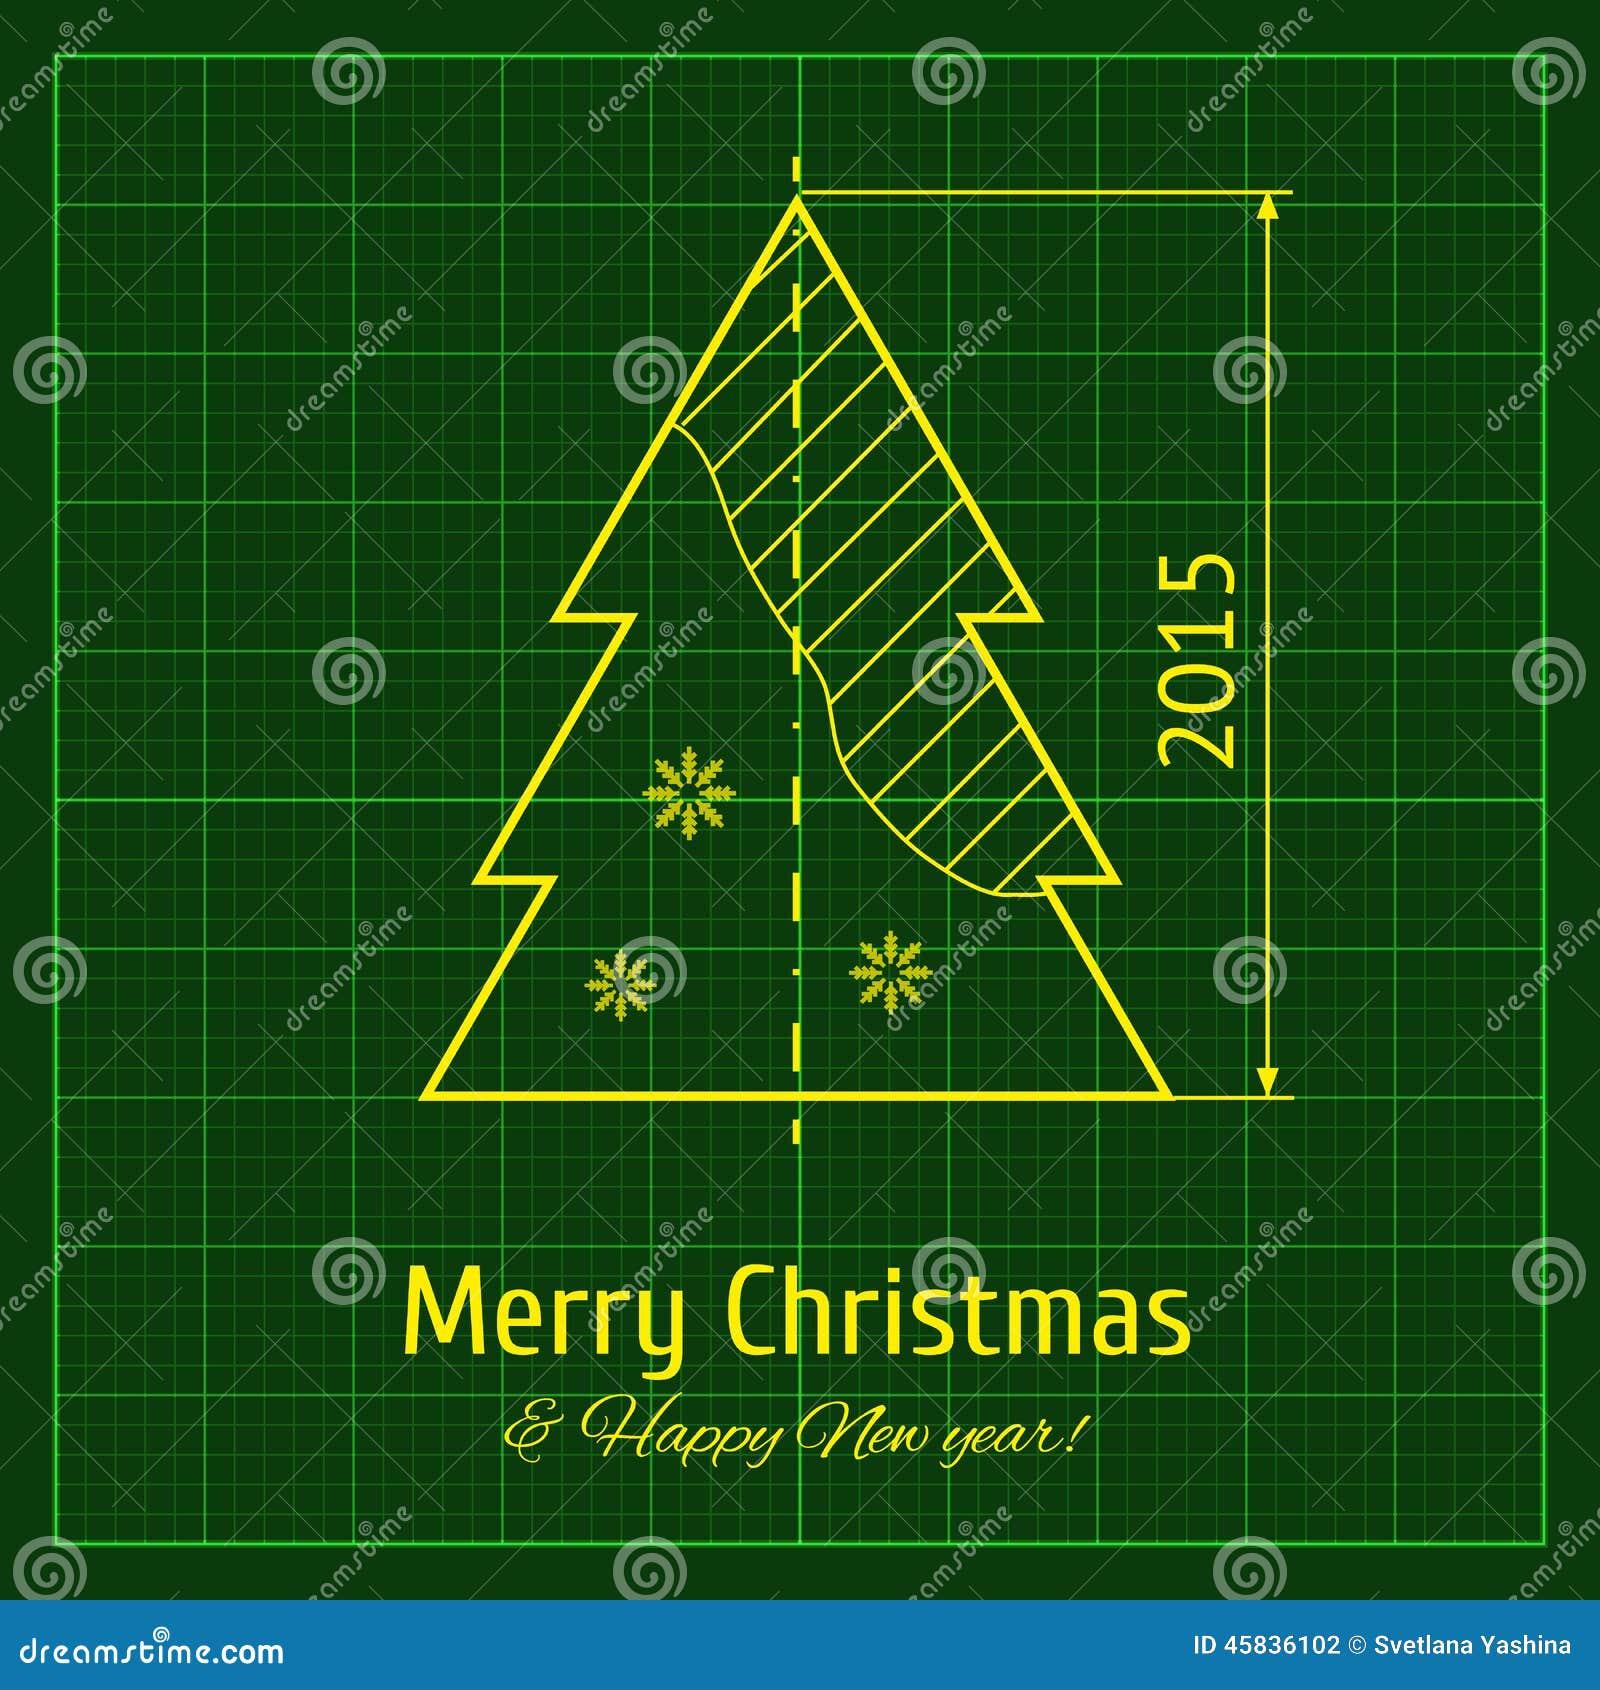 christmas tree stock vector illustration of measurement 45836102